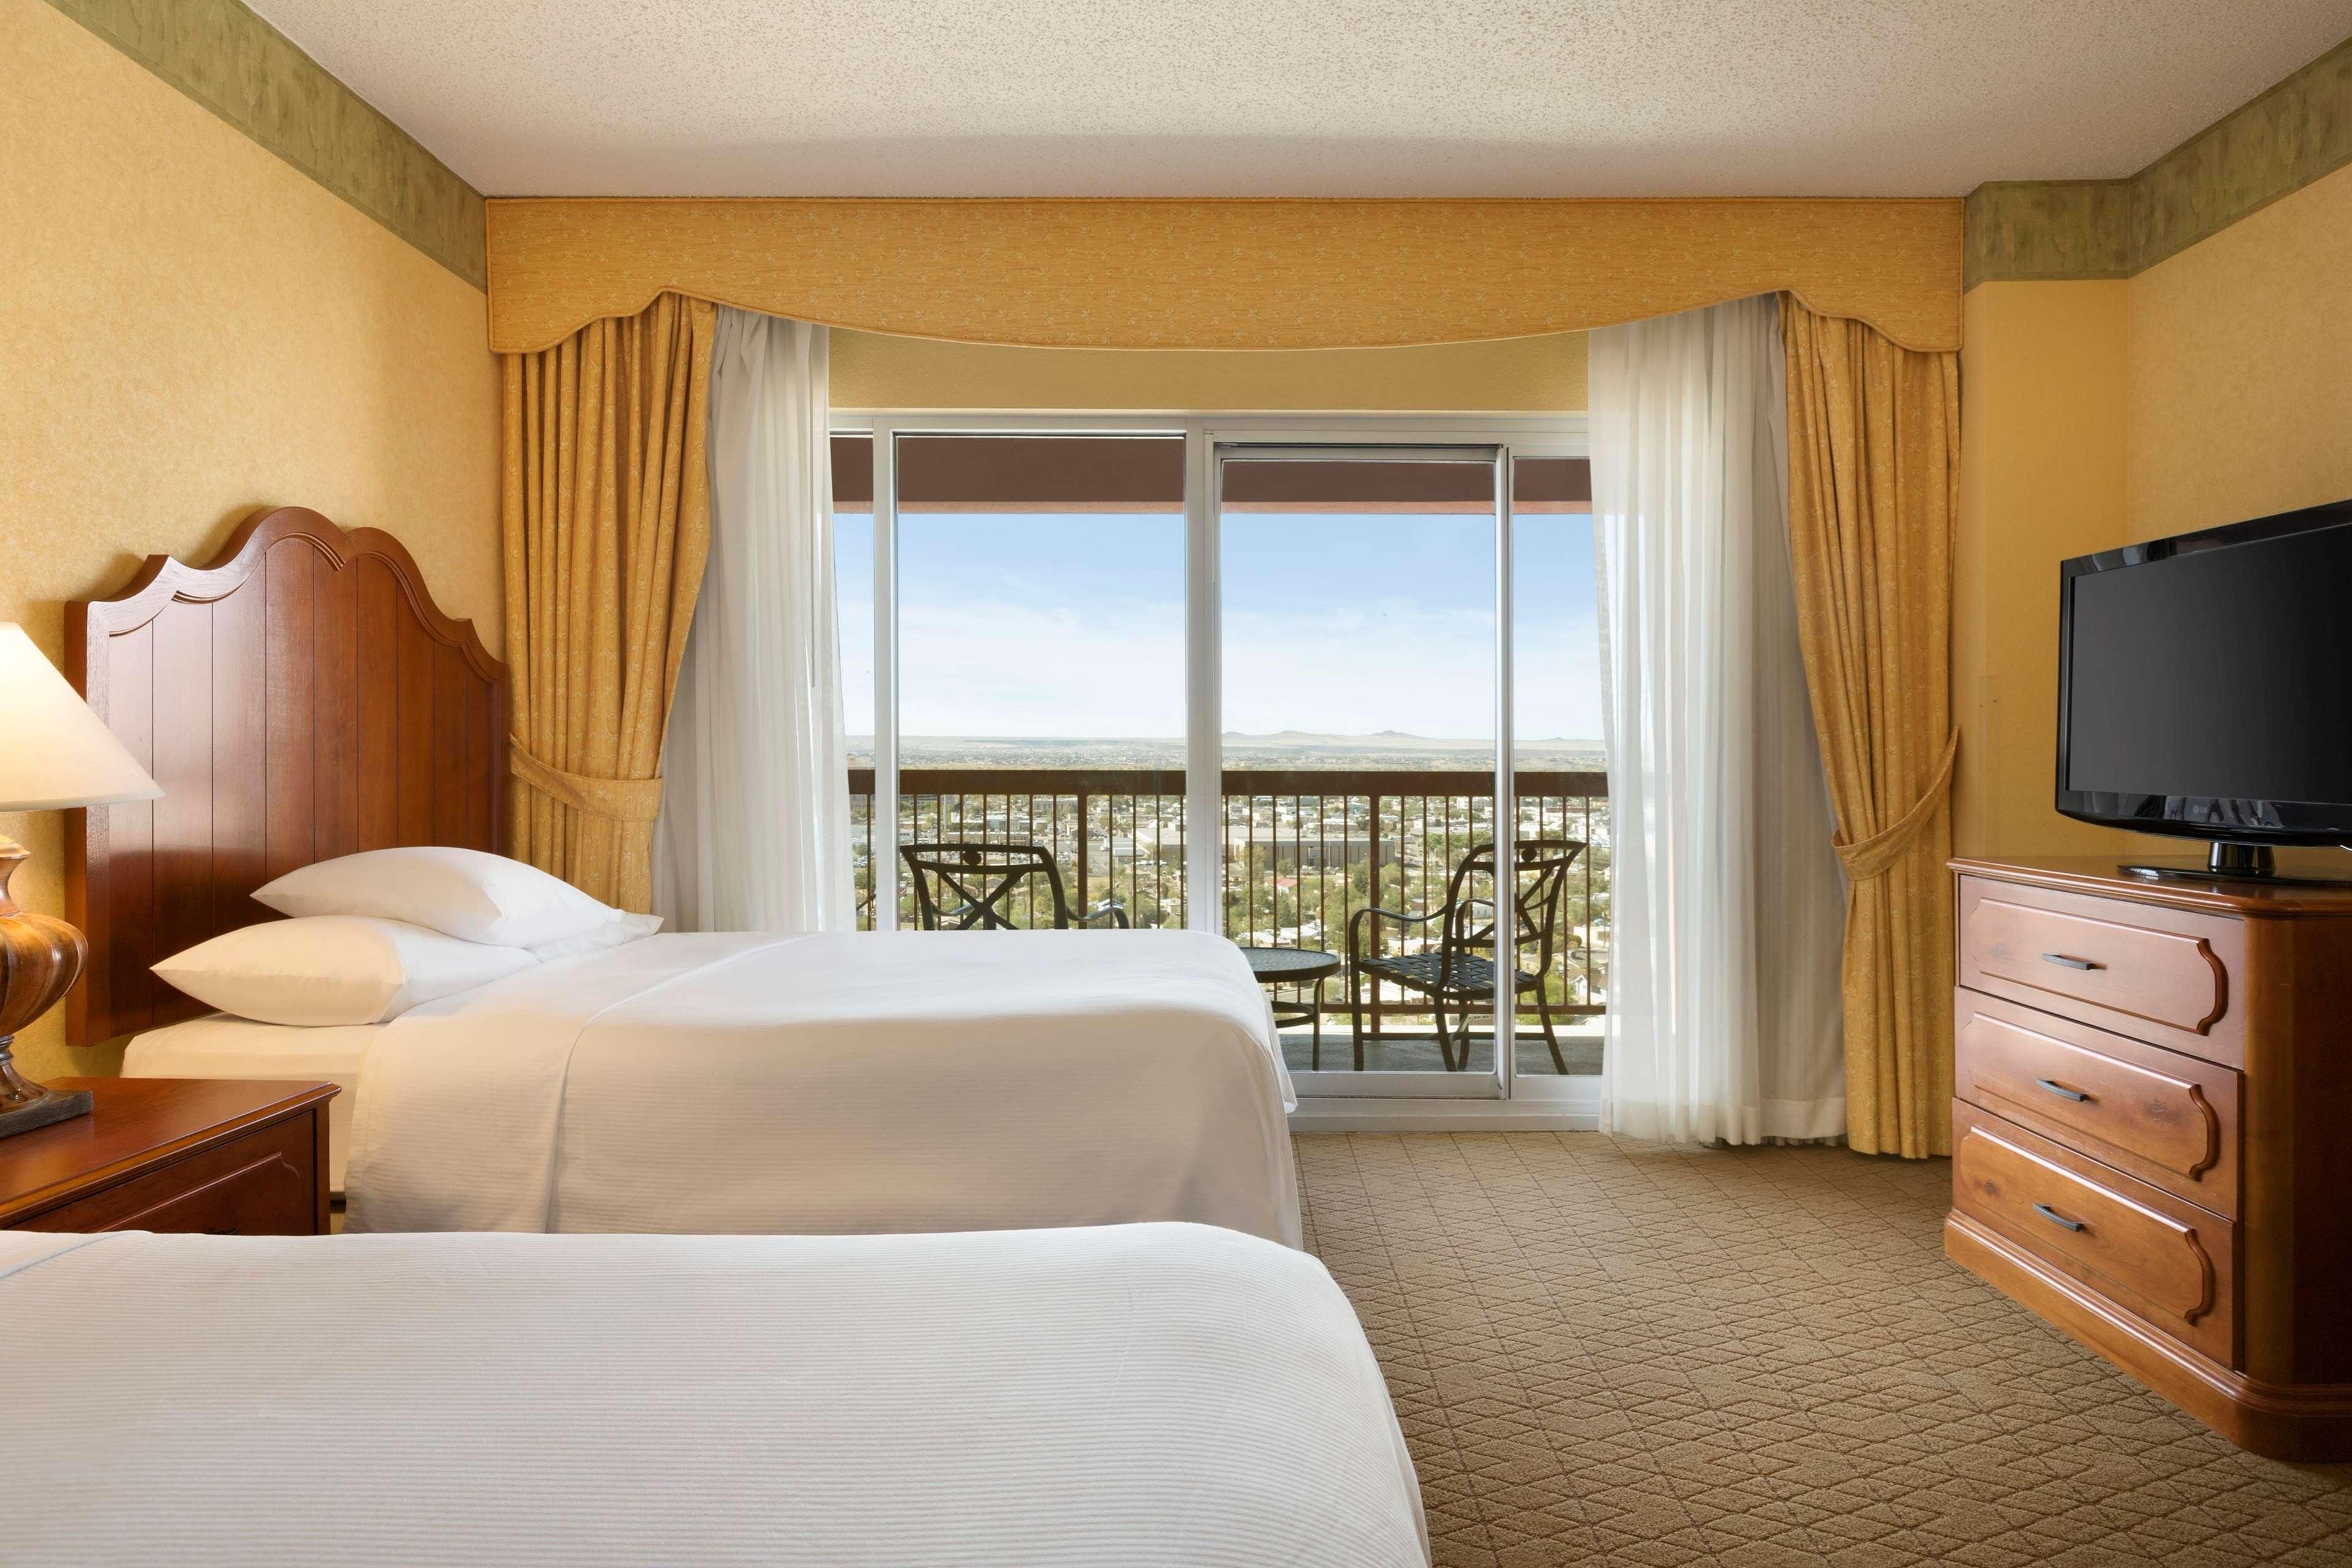 Embassy Suites by Hilton Albuquerque Hotel & Spa image 15